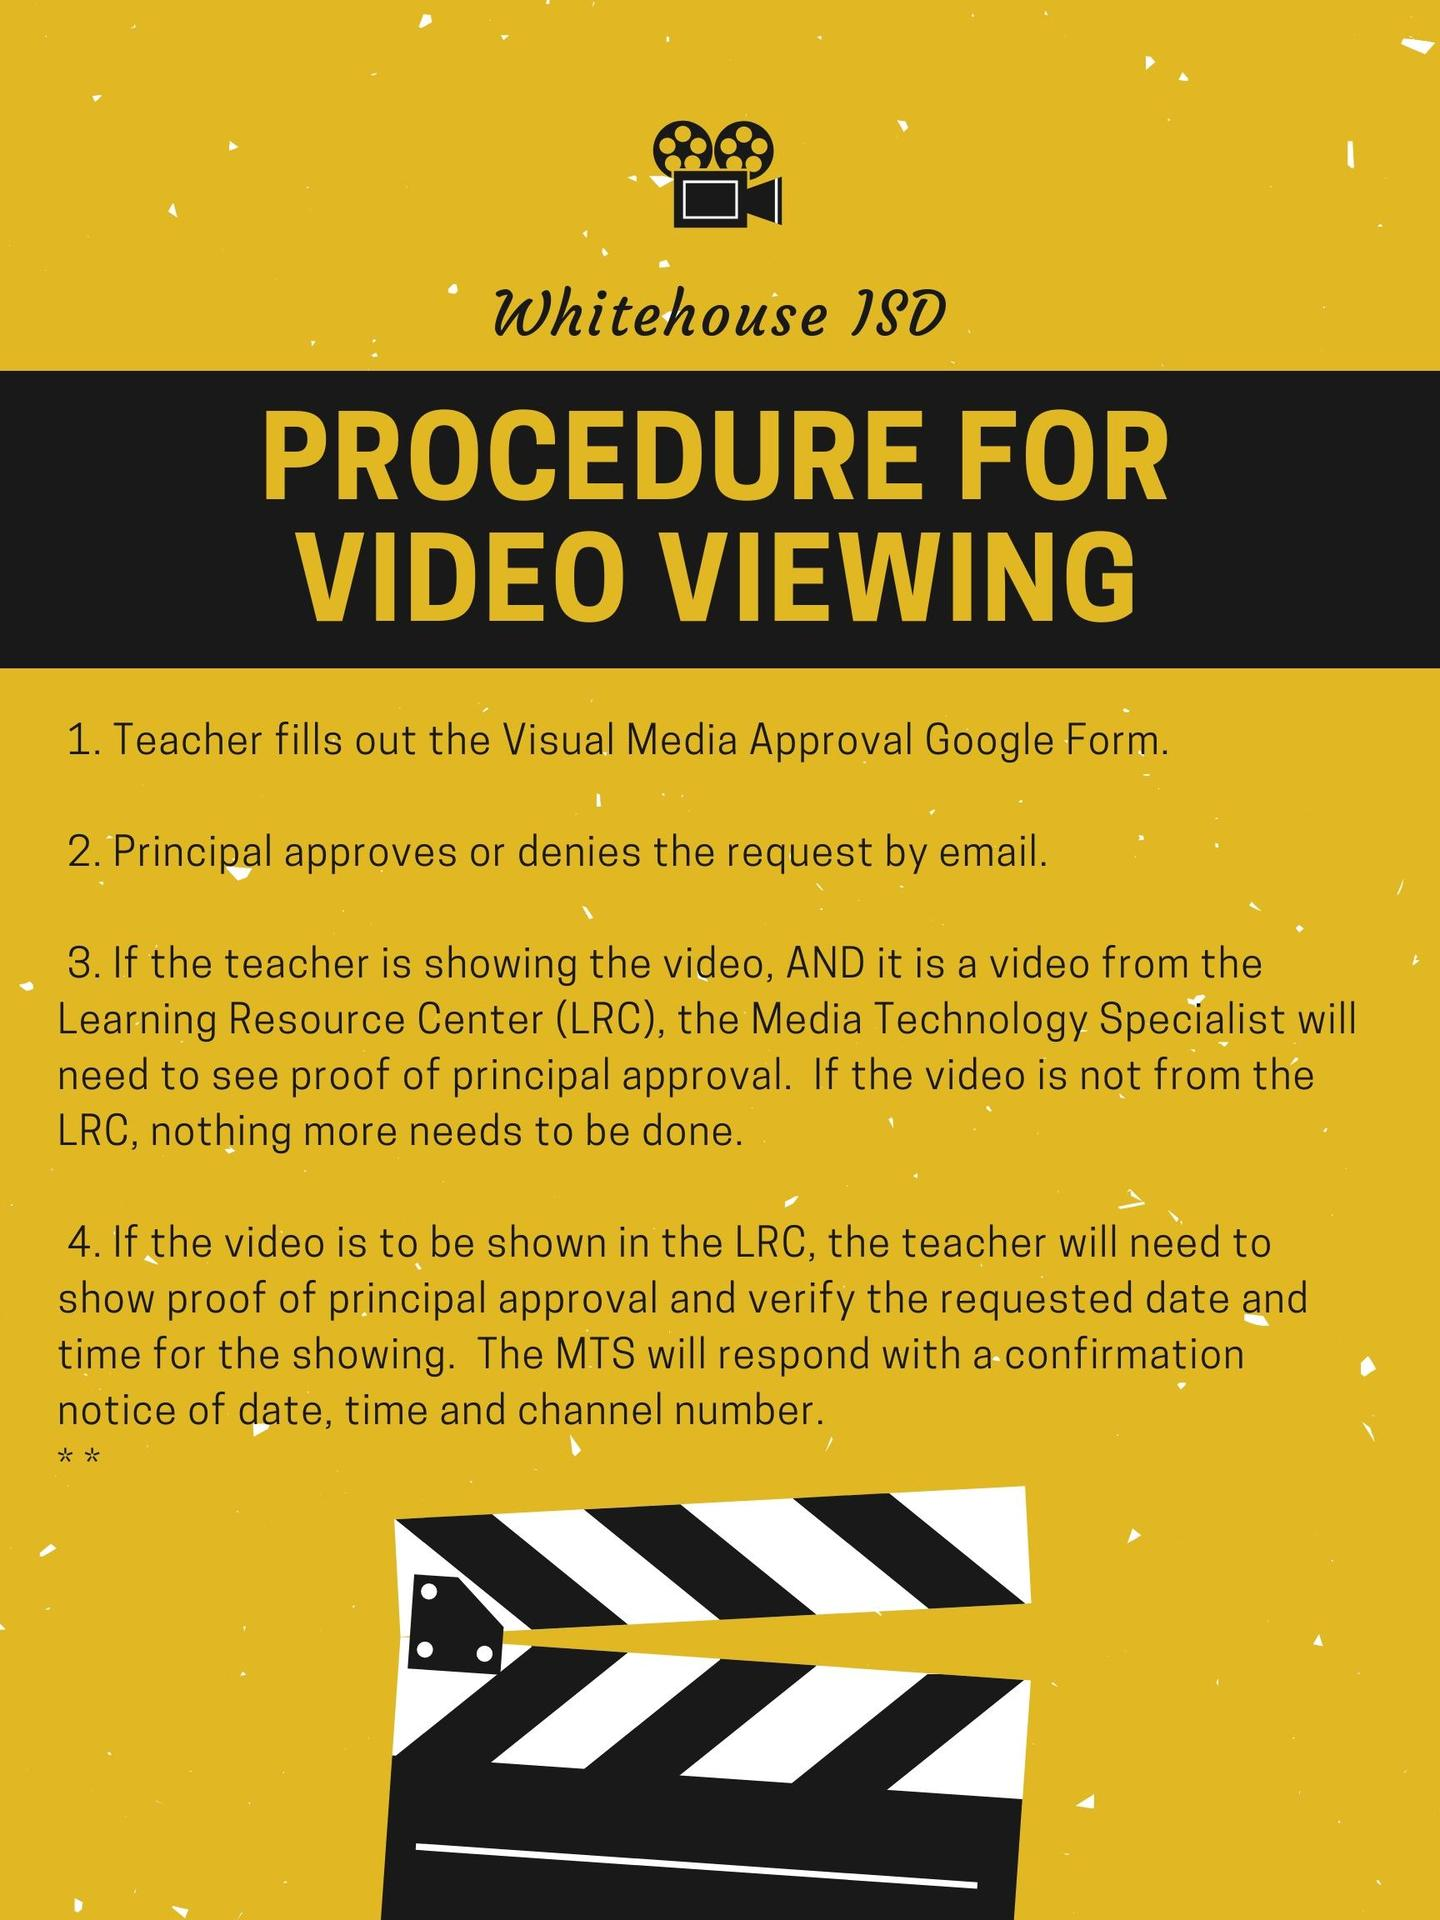 Video Media Technology Instructional Technology Whitehouse